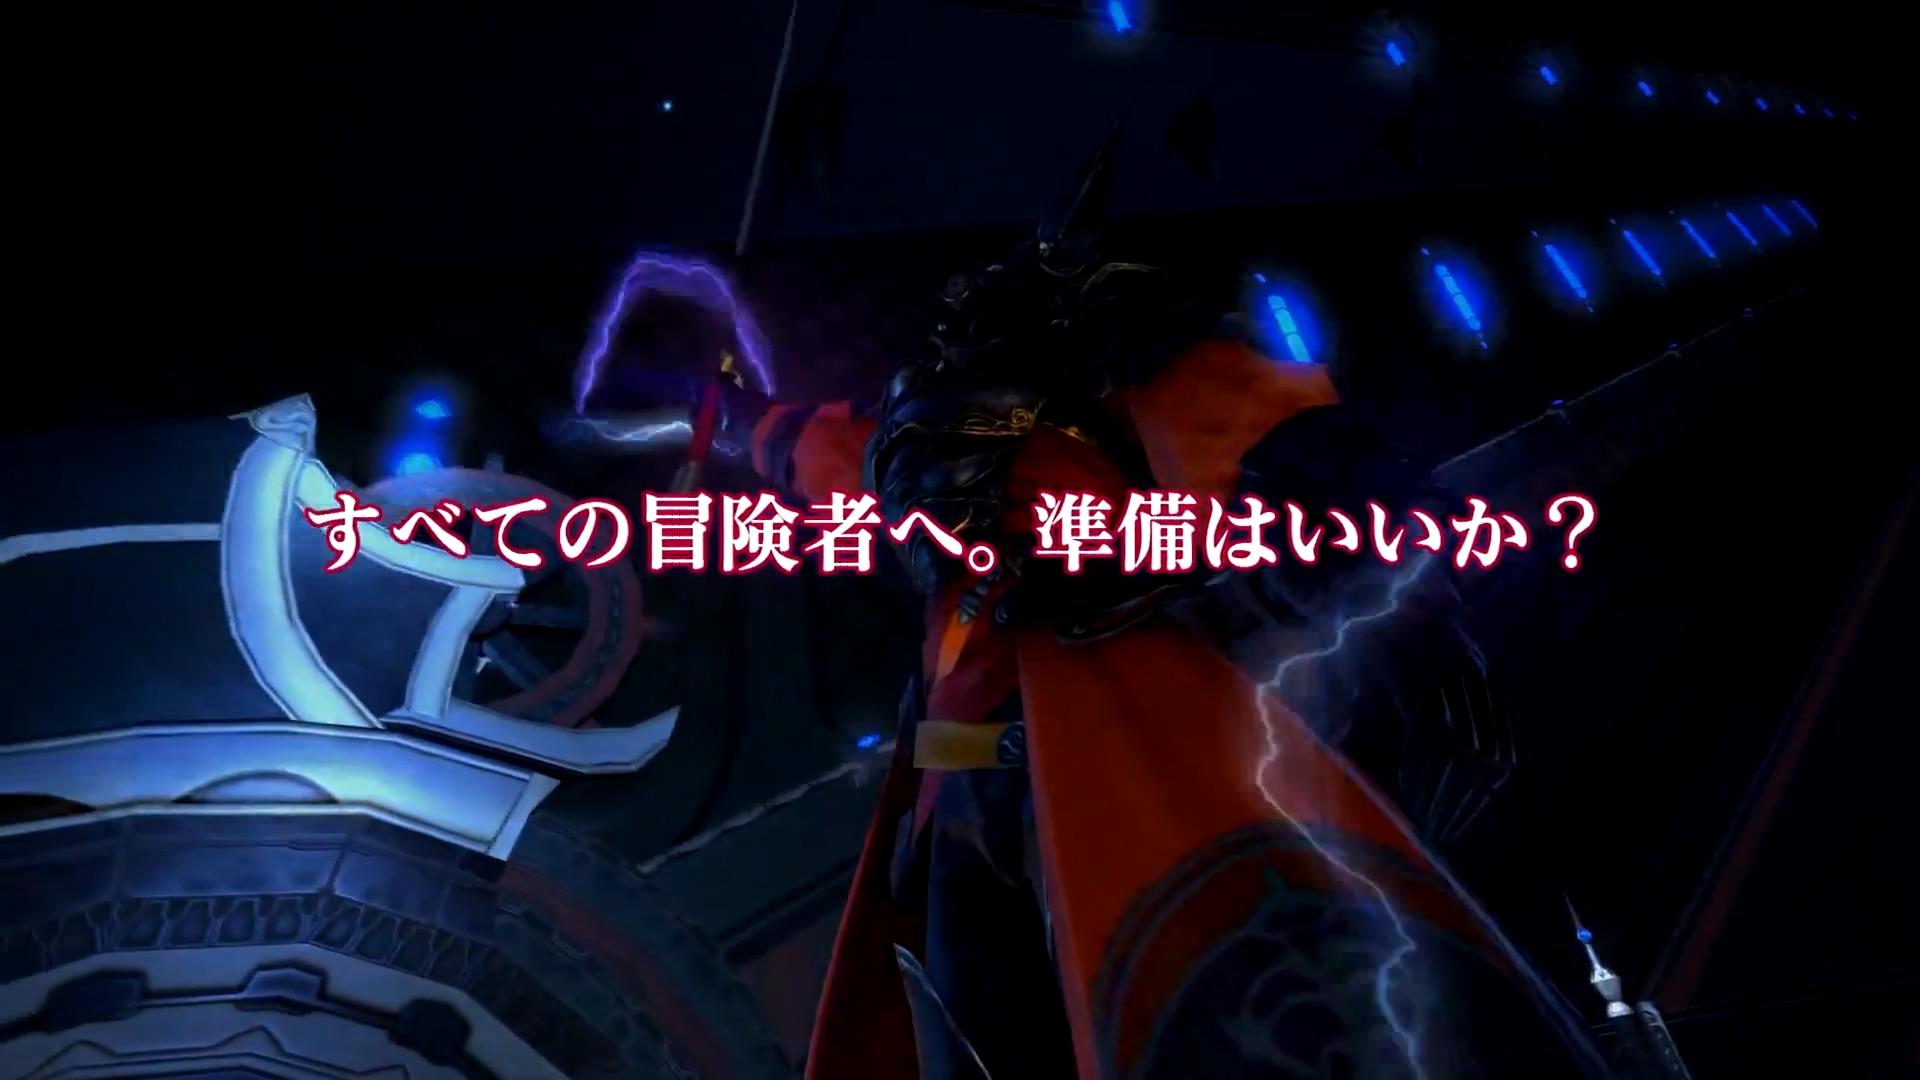 FFXIV:新生エオルゼア ダンジョントレーラー Part 2 公開